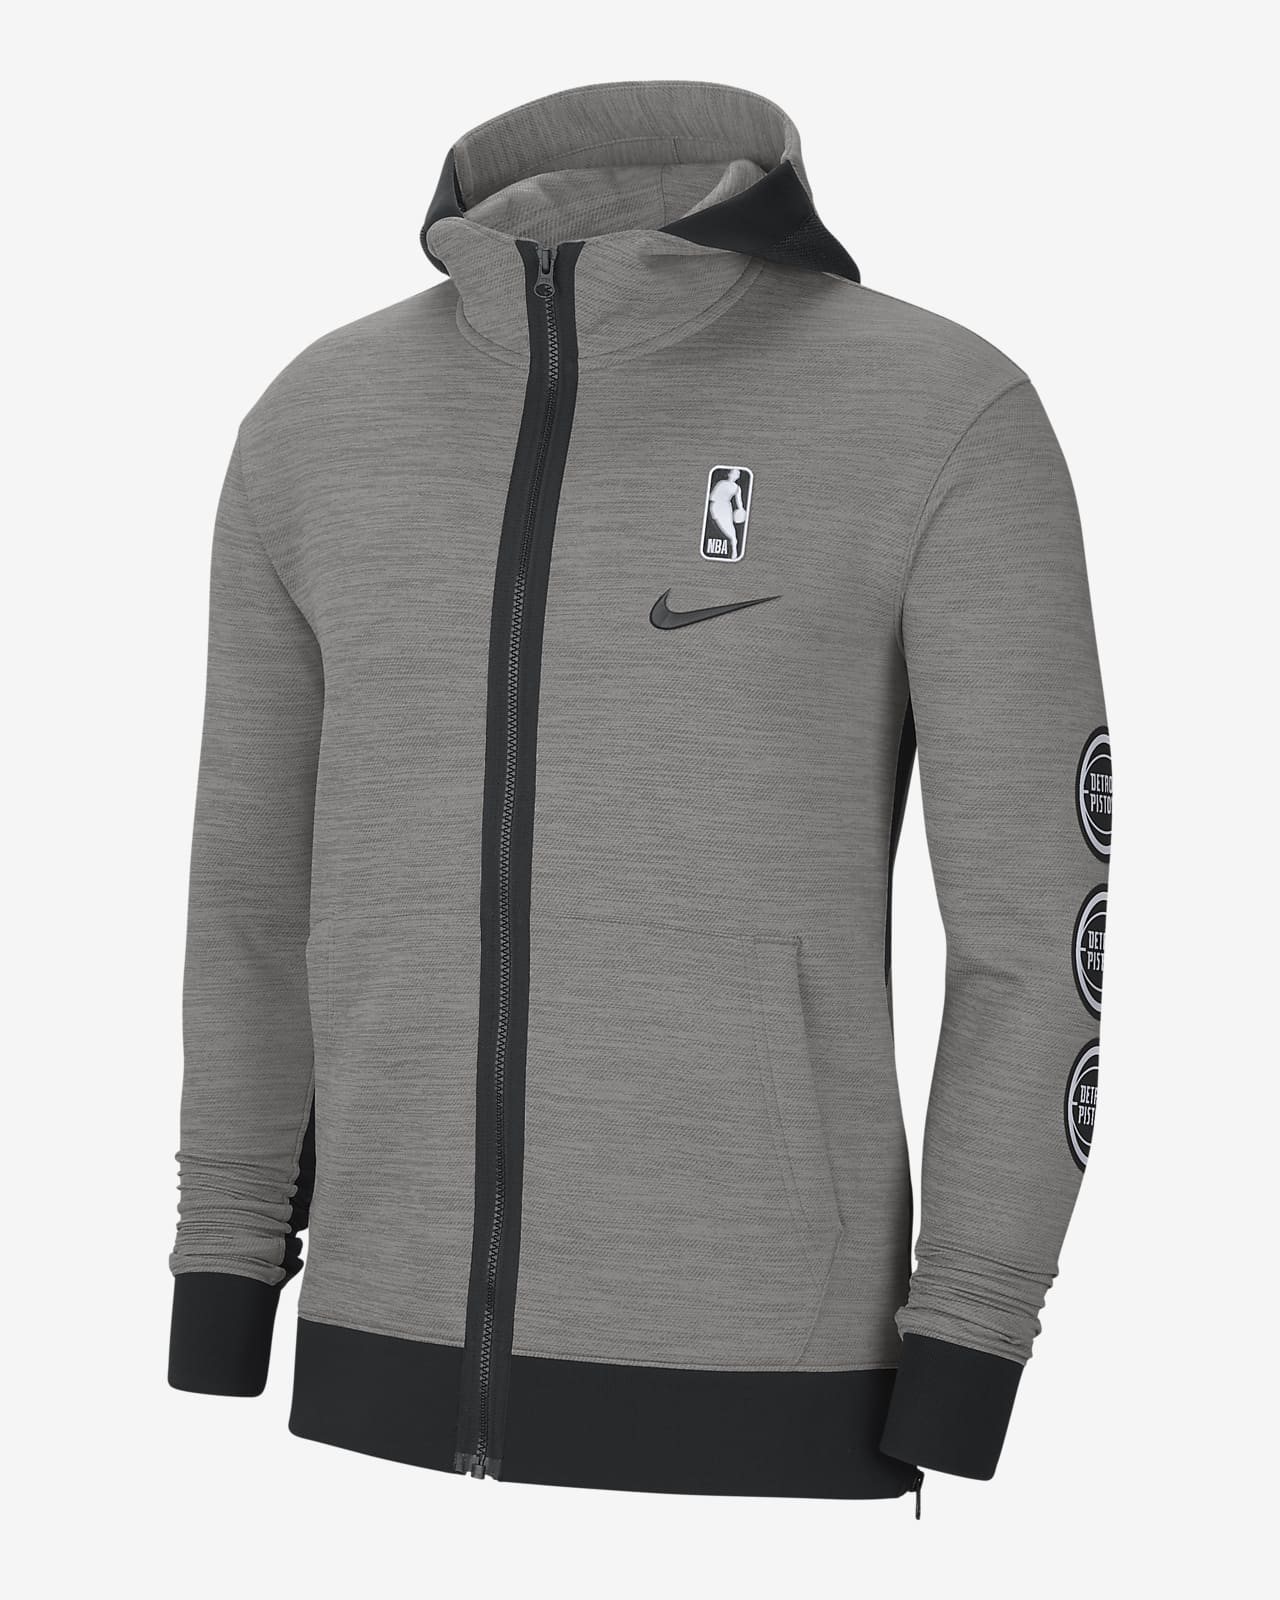 Pistons Showtime Men's Nike Therma Flex NBA Hoodie